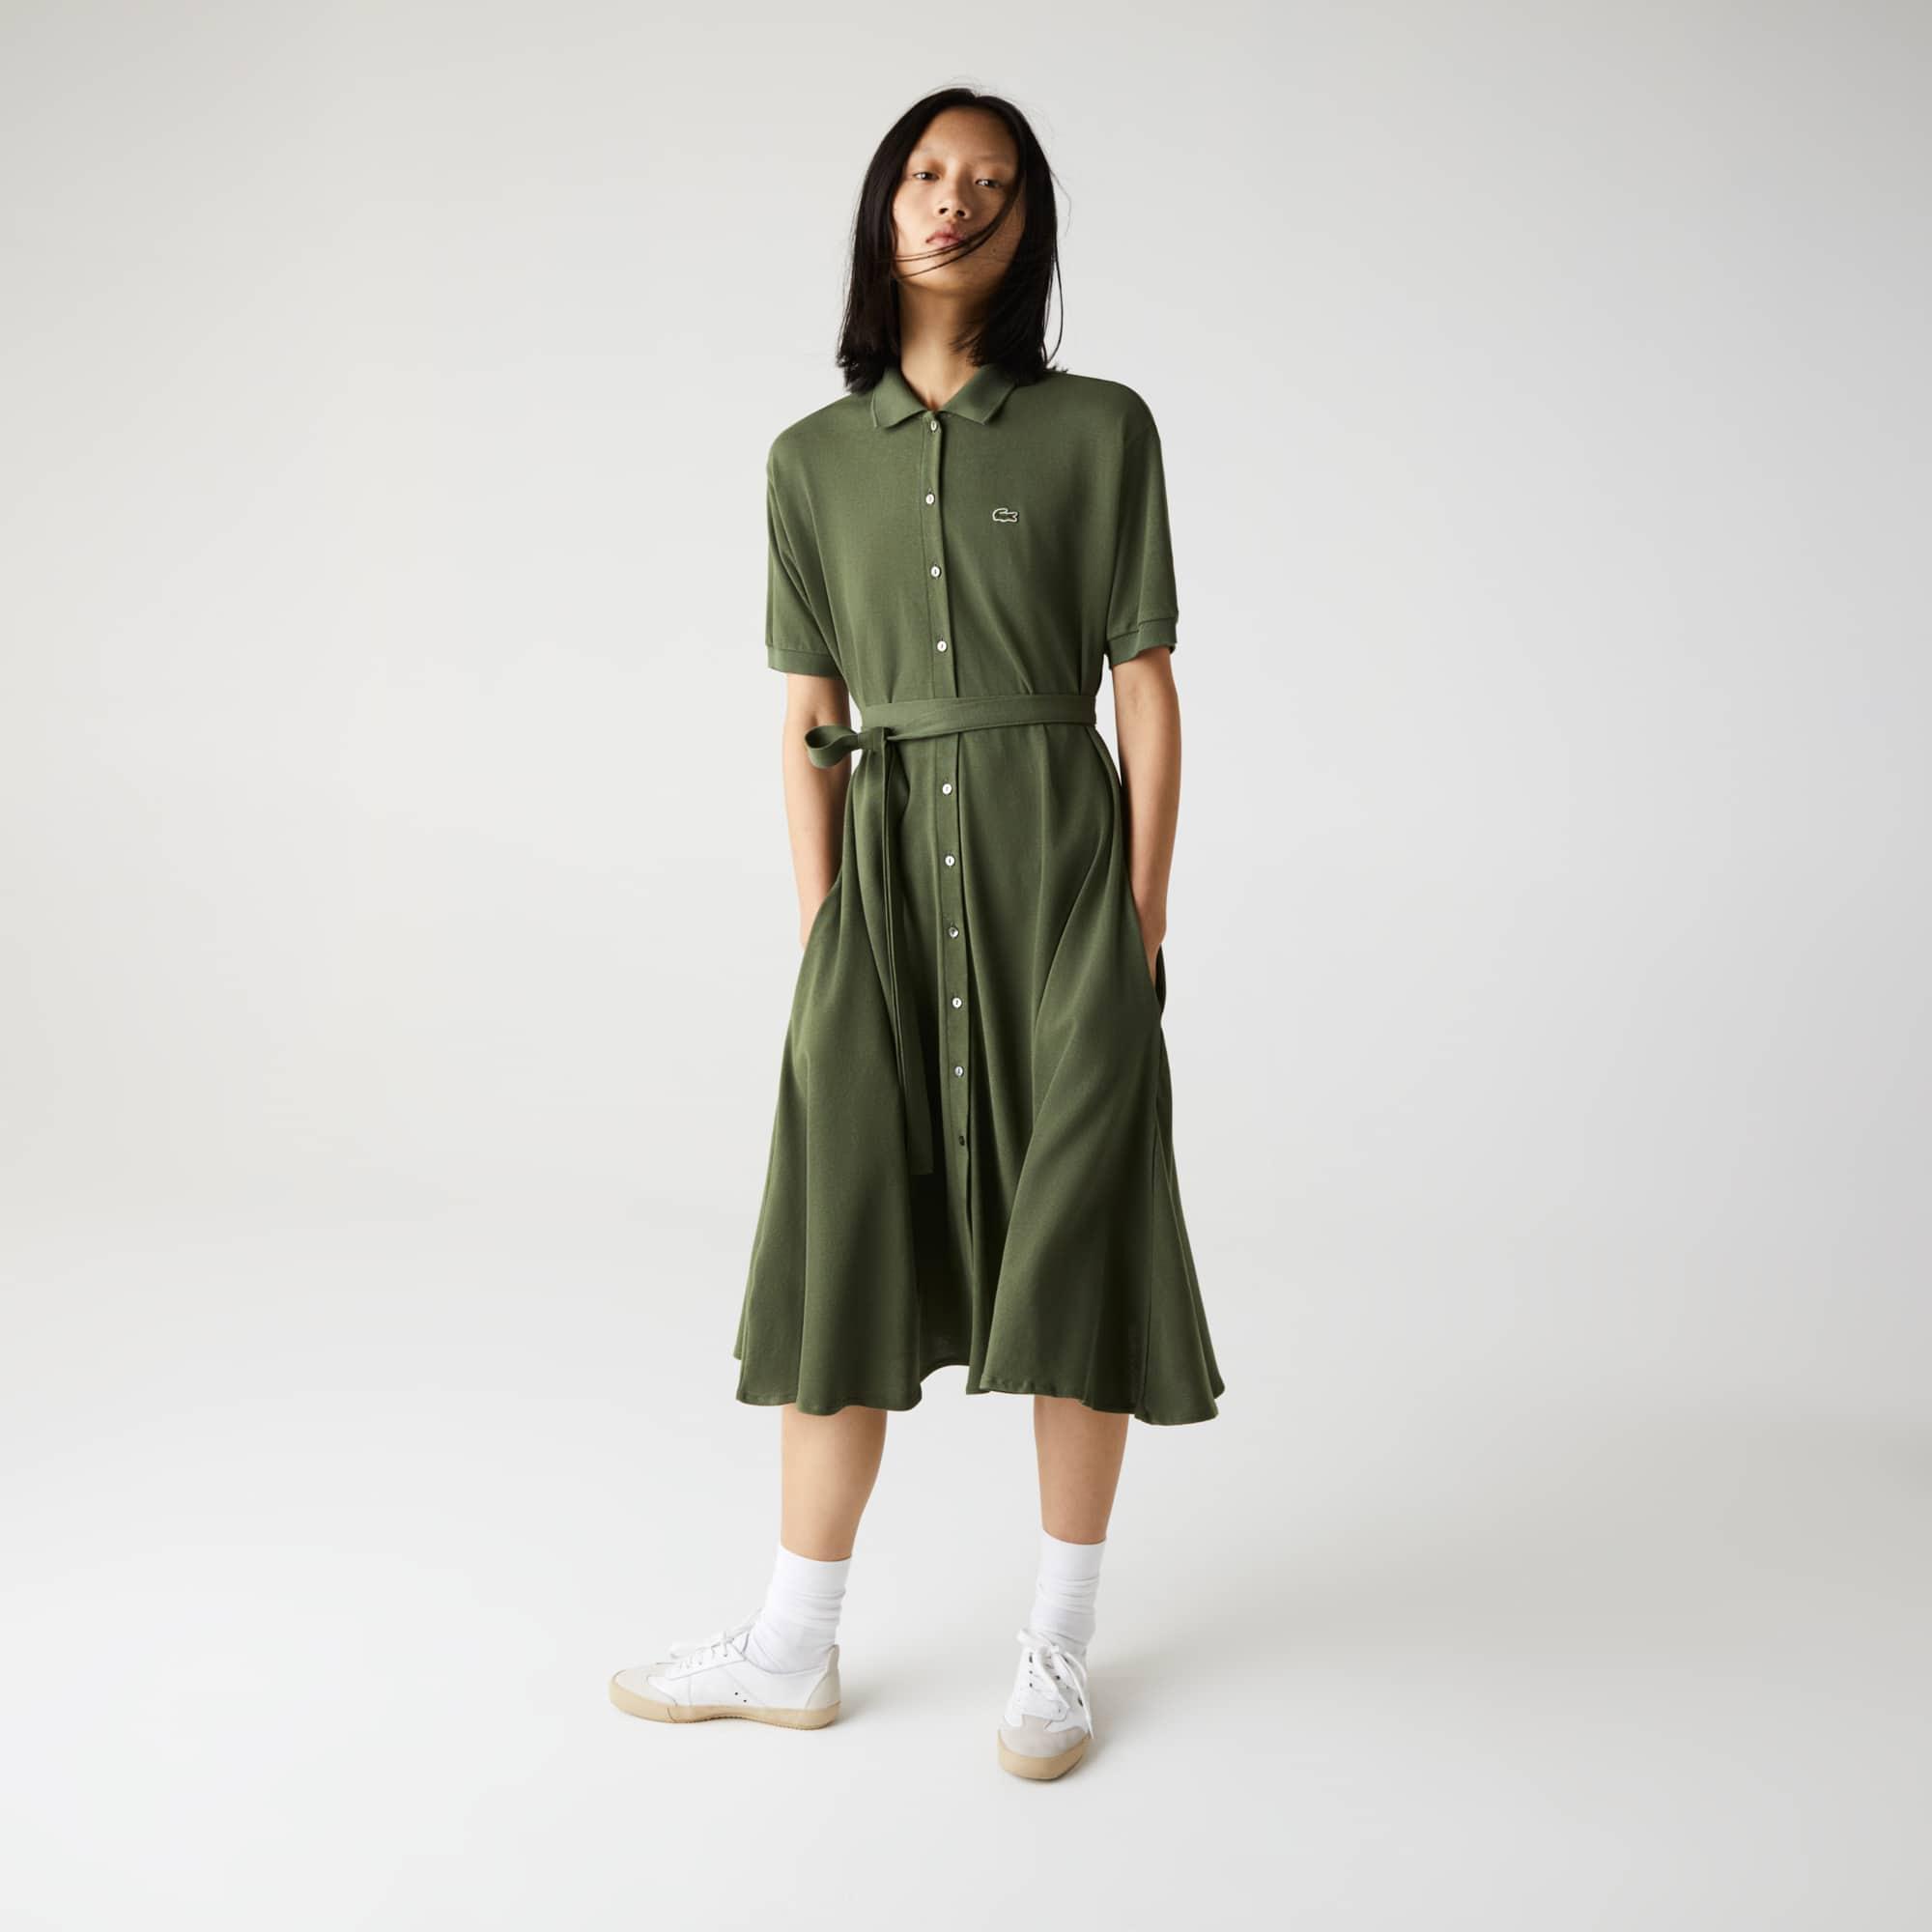 Lacoste Womens S//S Striped Cotton Pique Classic Polo Dress